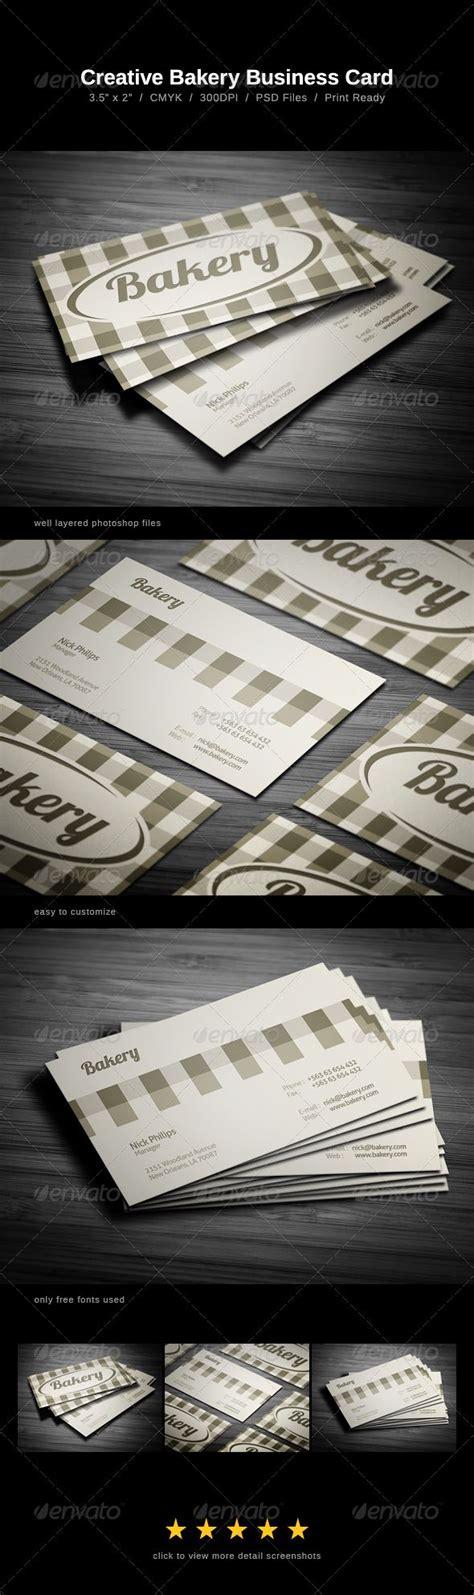 Bakery Business Card Design